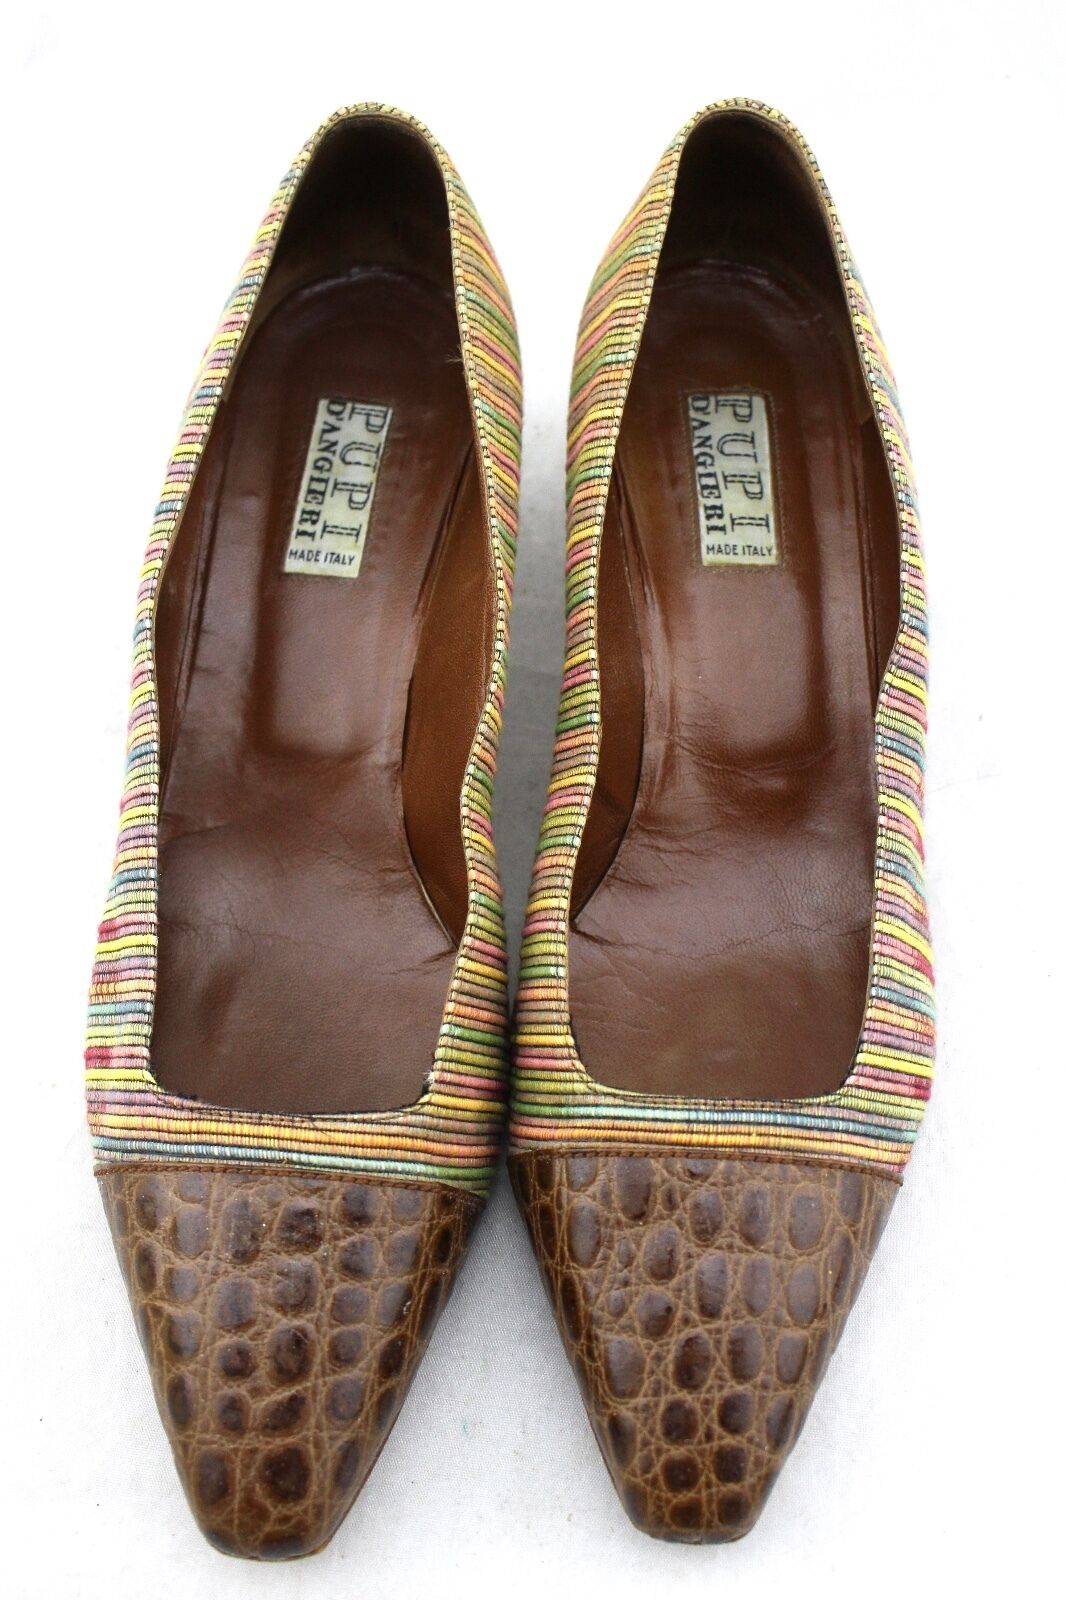 215 PUPI D'ANGIERI Vintage braun braun braun Croc Leather Multi-Farbe Stripe Fabric Pumps 4df626